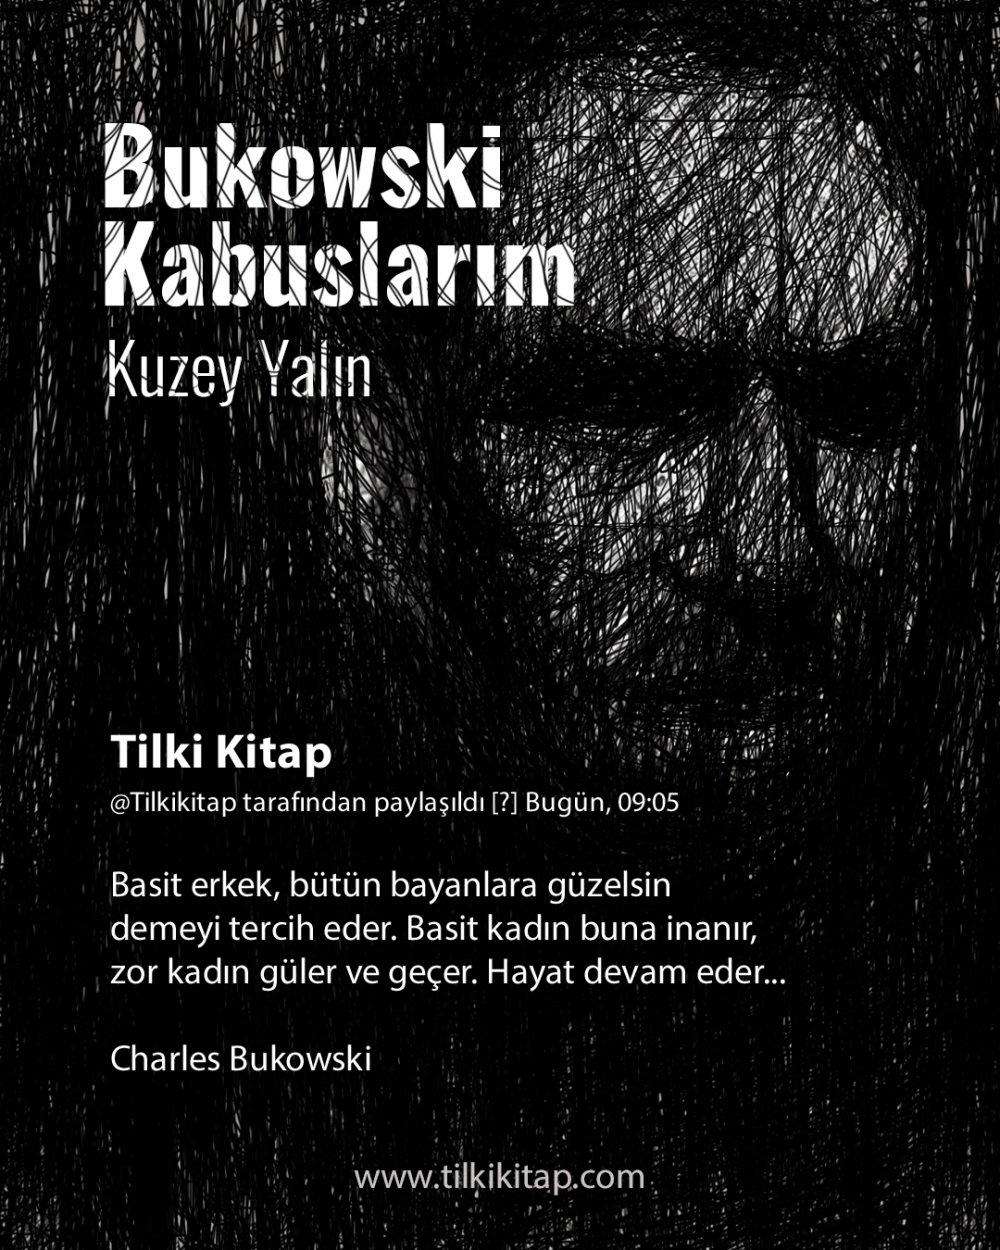 Charles Bukowski, Charles Bukowski Alıntı, Charles Bukowski Sözleri, Charles Bukowski Kitapları, Bukowski      Kabuslarım, Bukowski Kabuslarım Kuzey Y